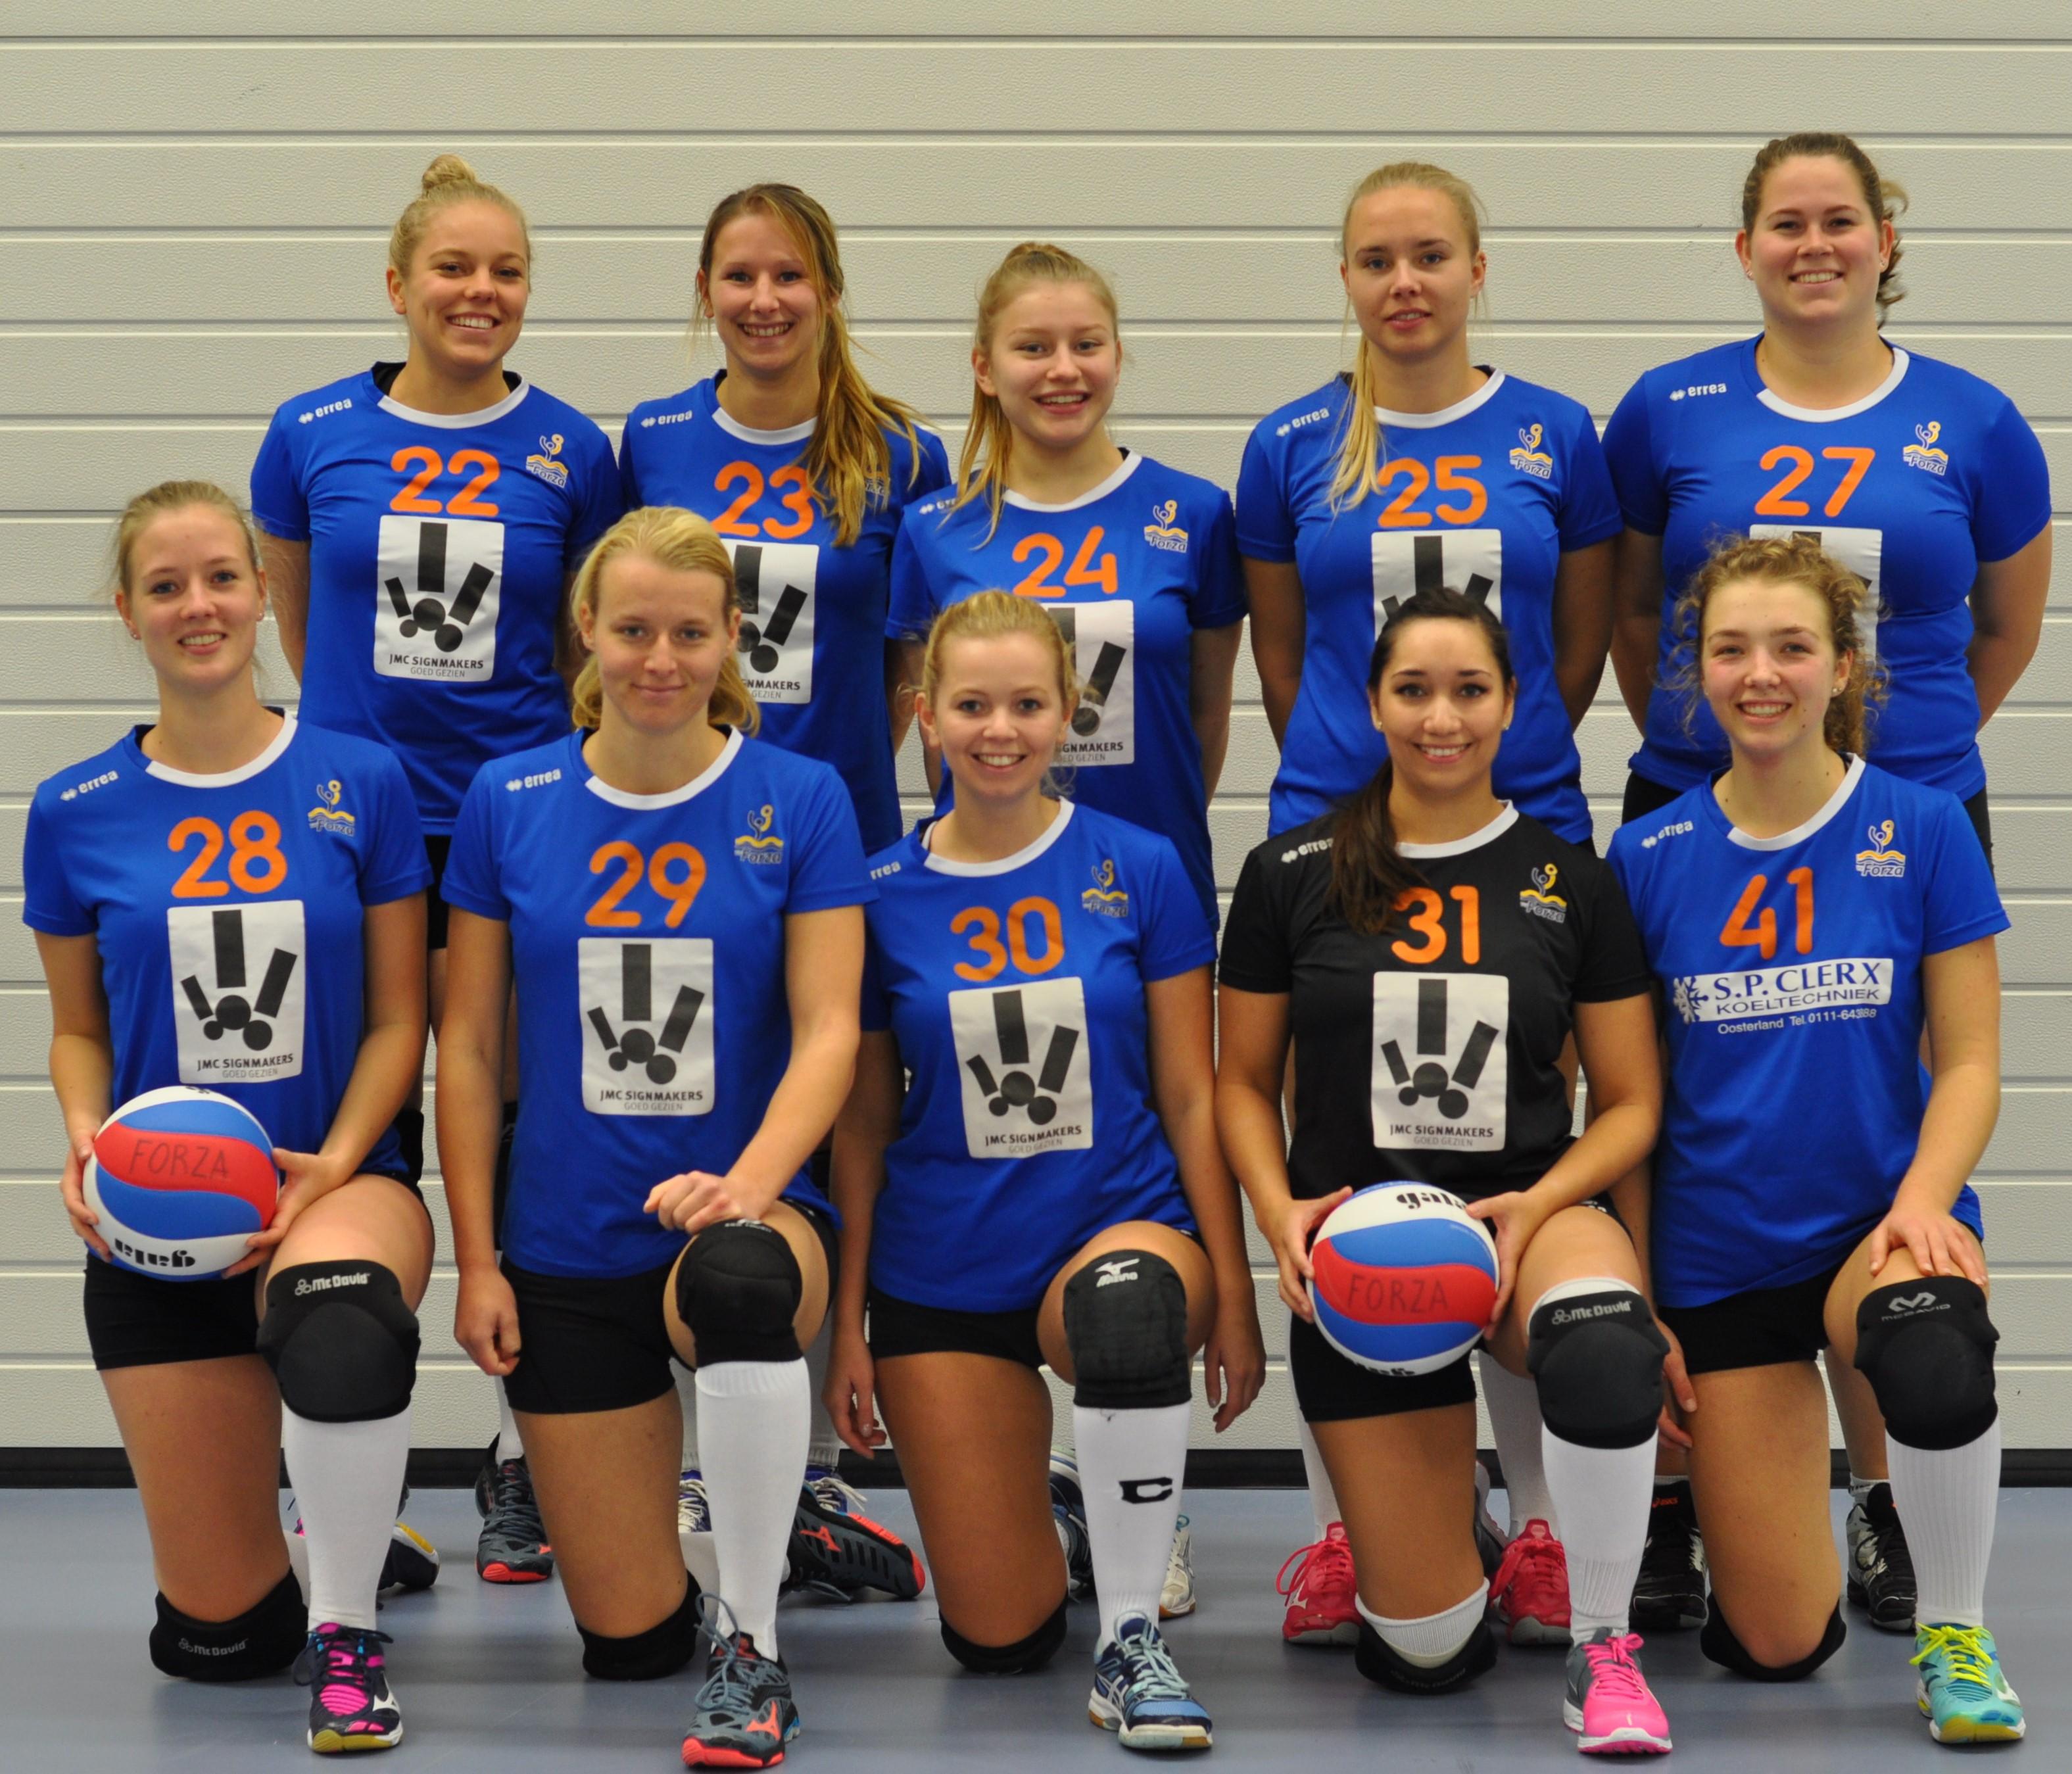 Dames 2 Forza Schouwen-Duiveland volleybal